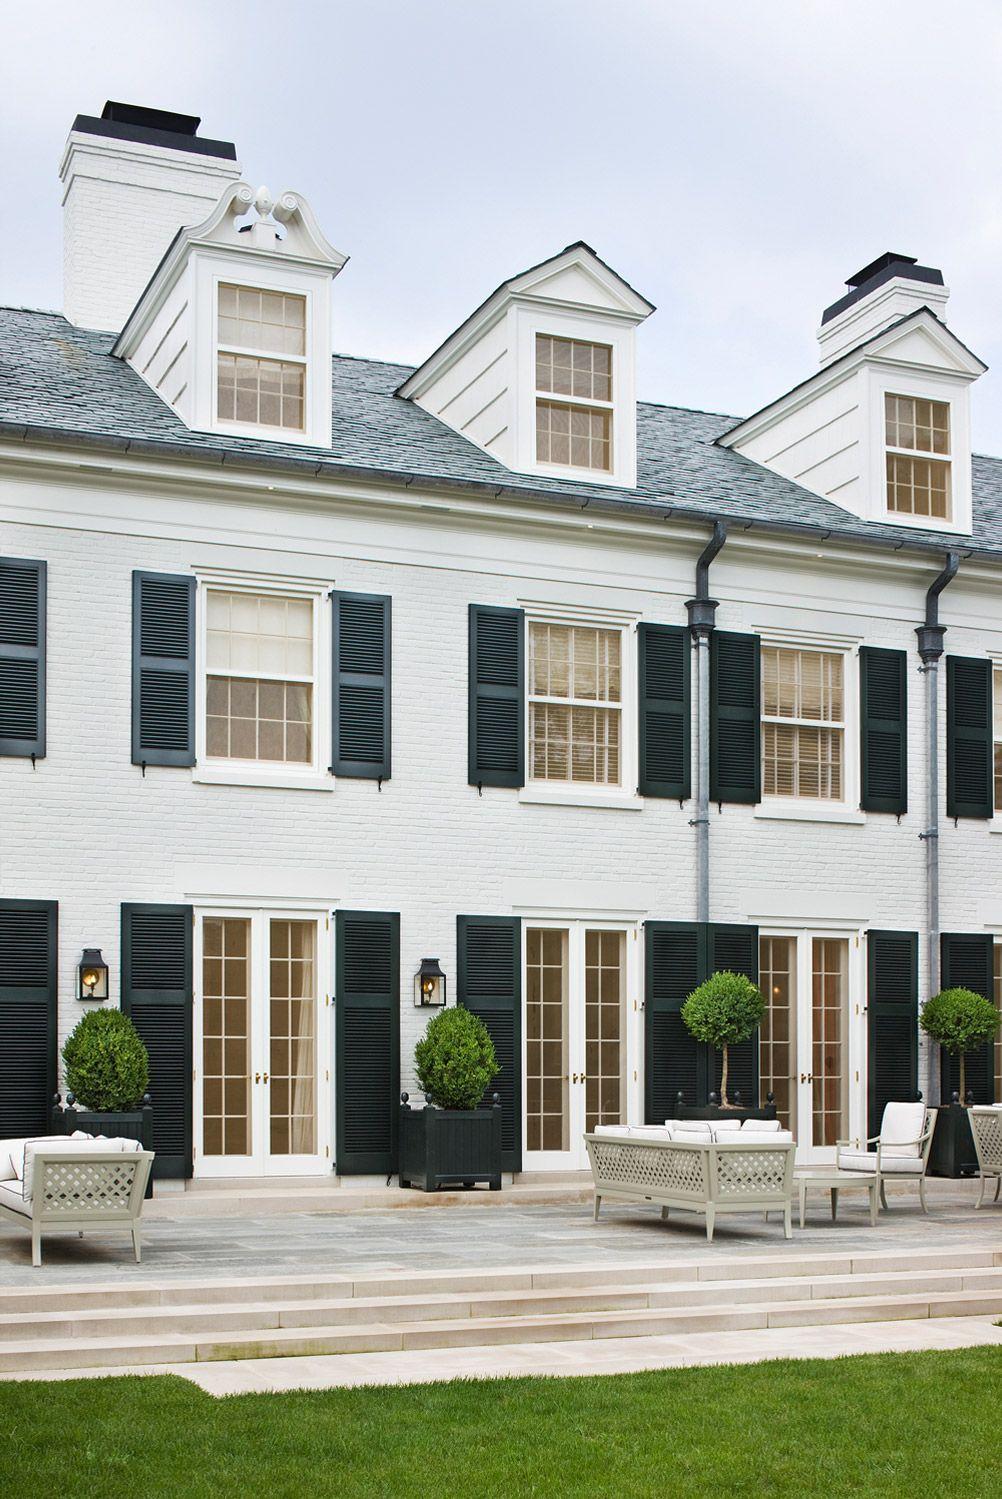 G.P. Schafer Architect, PLLC | houses | Pinterest | Architects ...